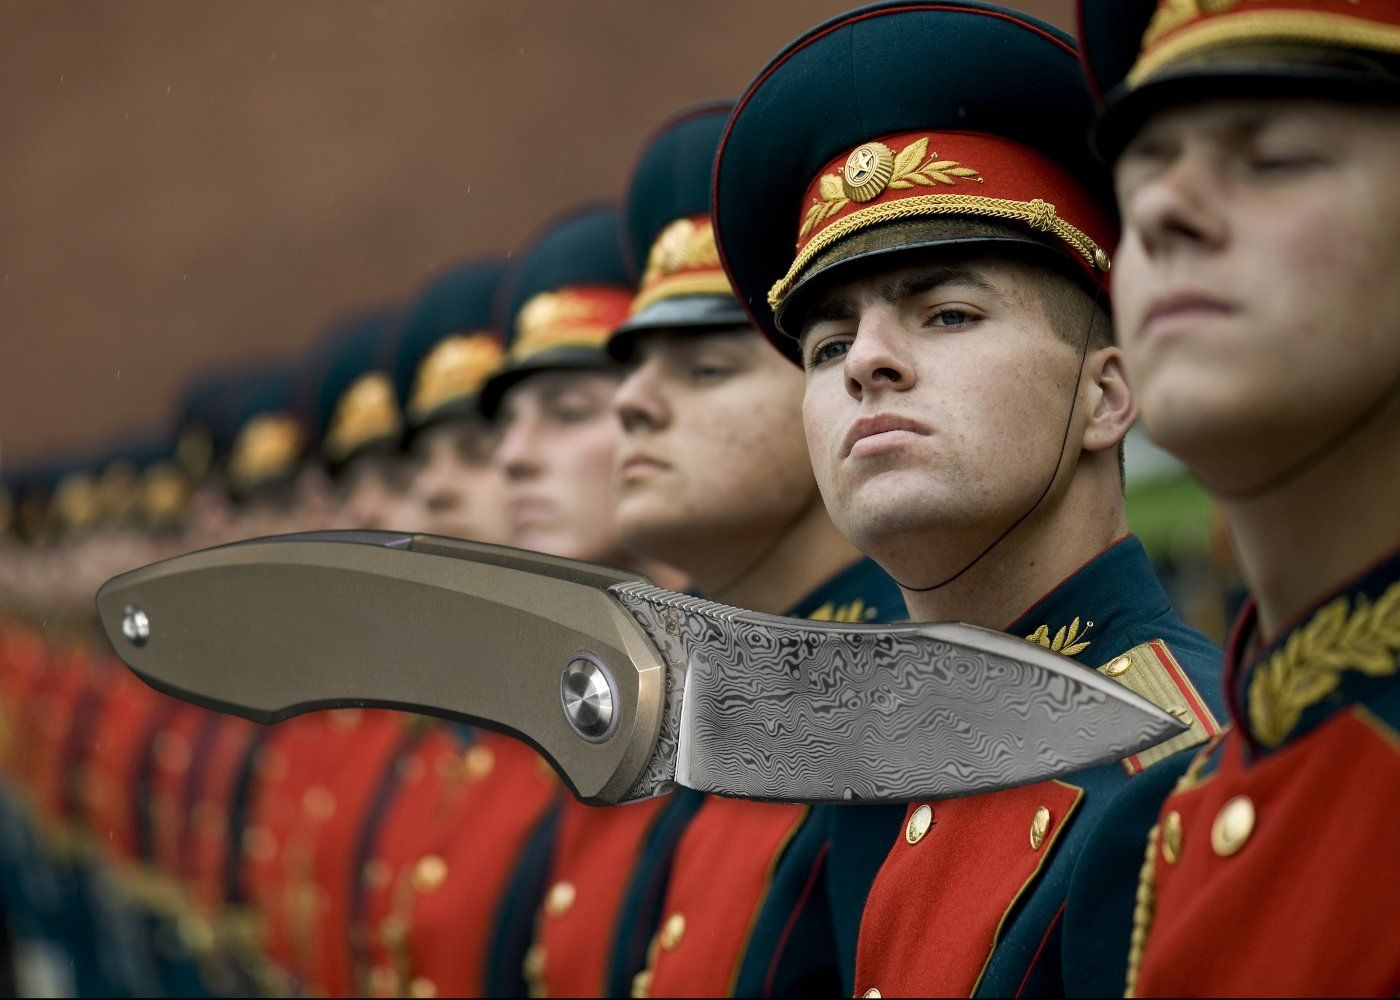 Russki von A- Cheburkov